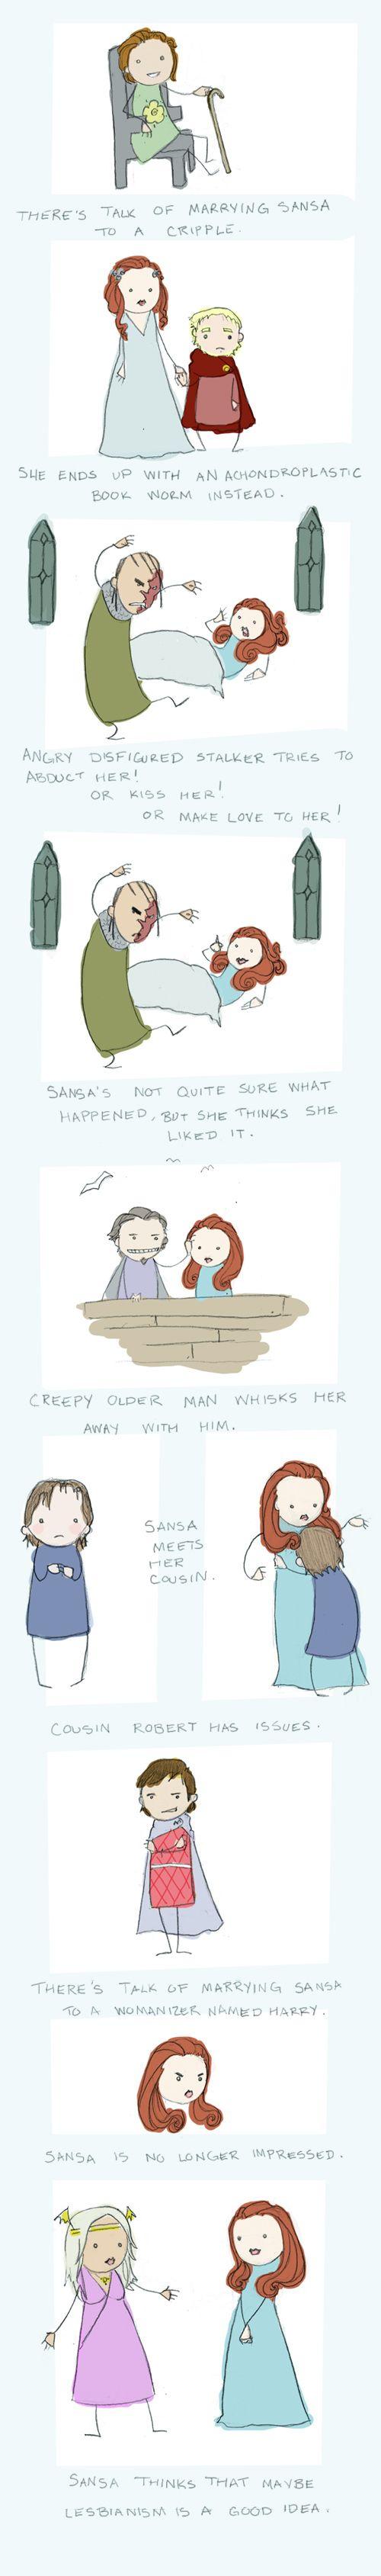 Artist: Alciha (Sansa's Dating Woes 2/2)